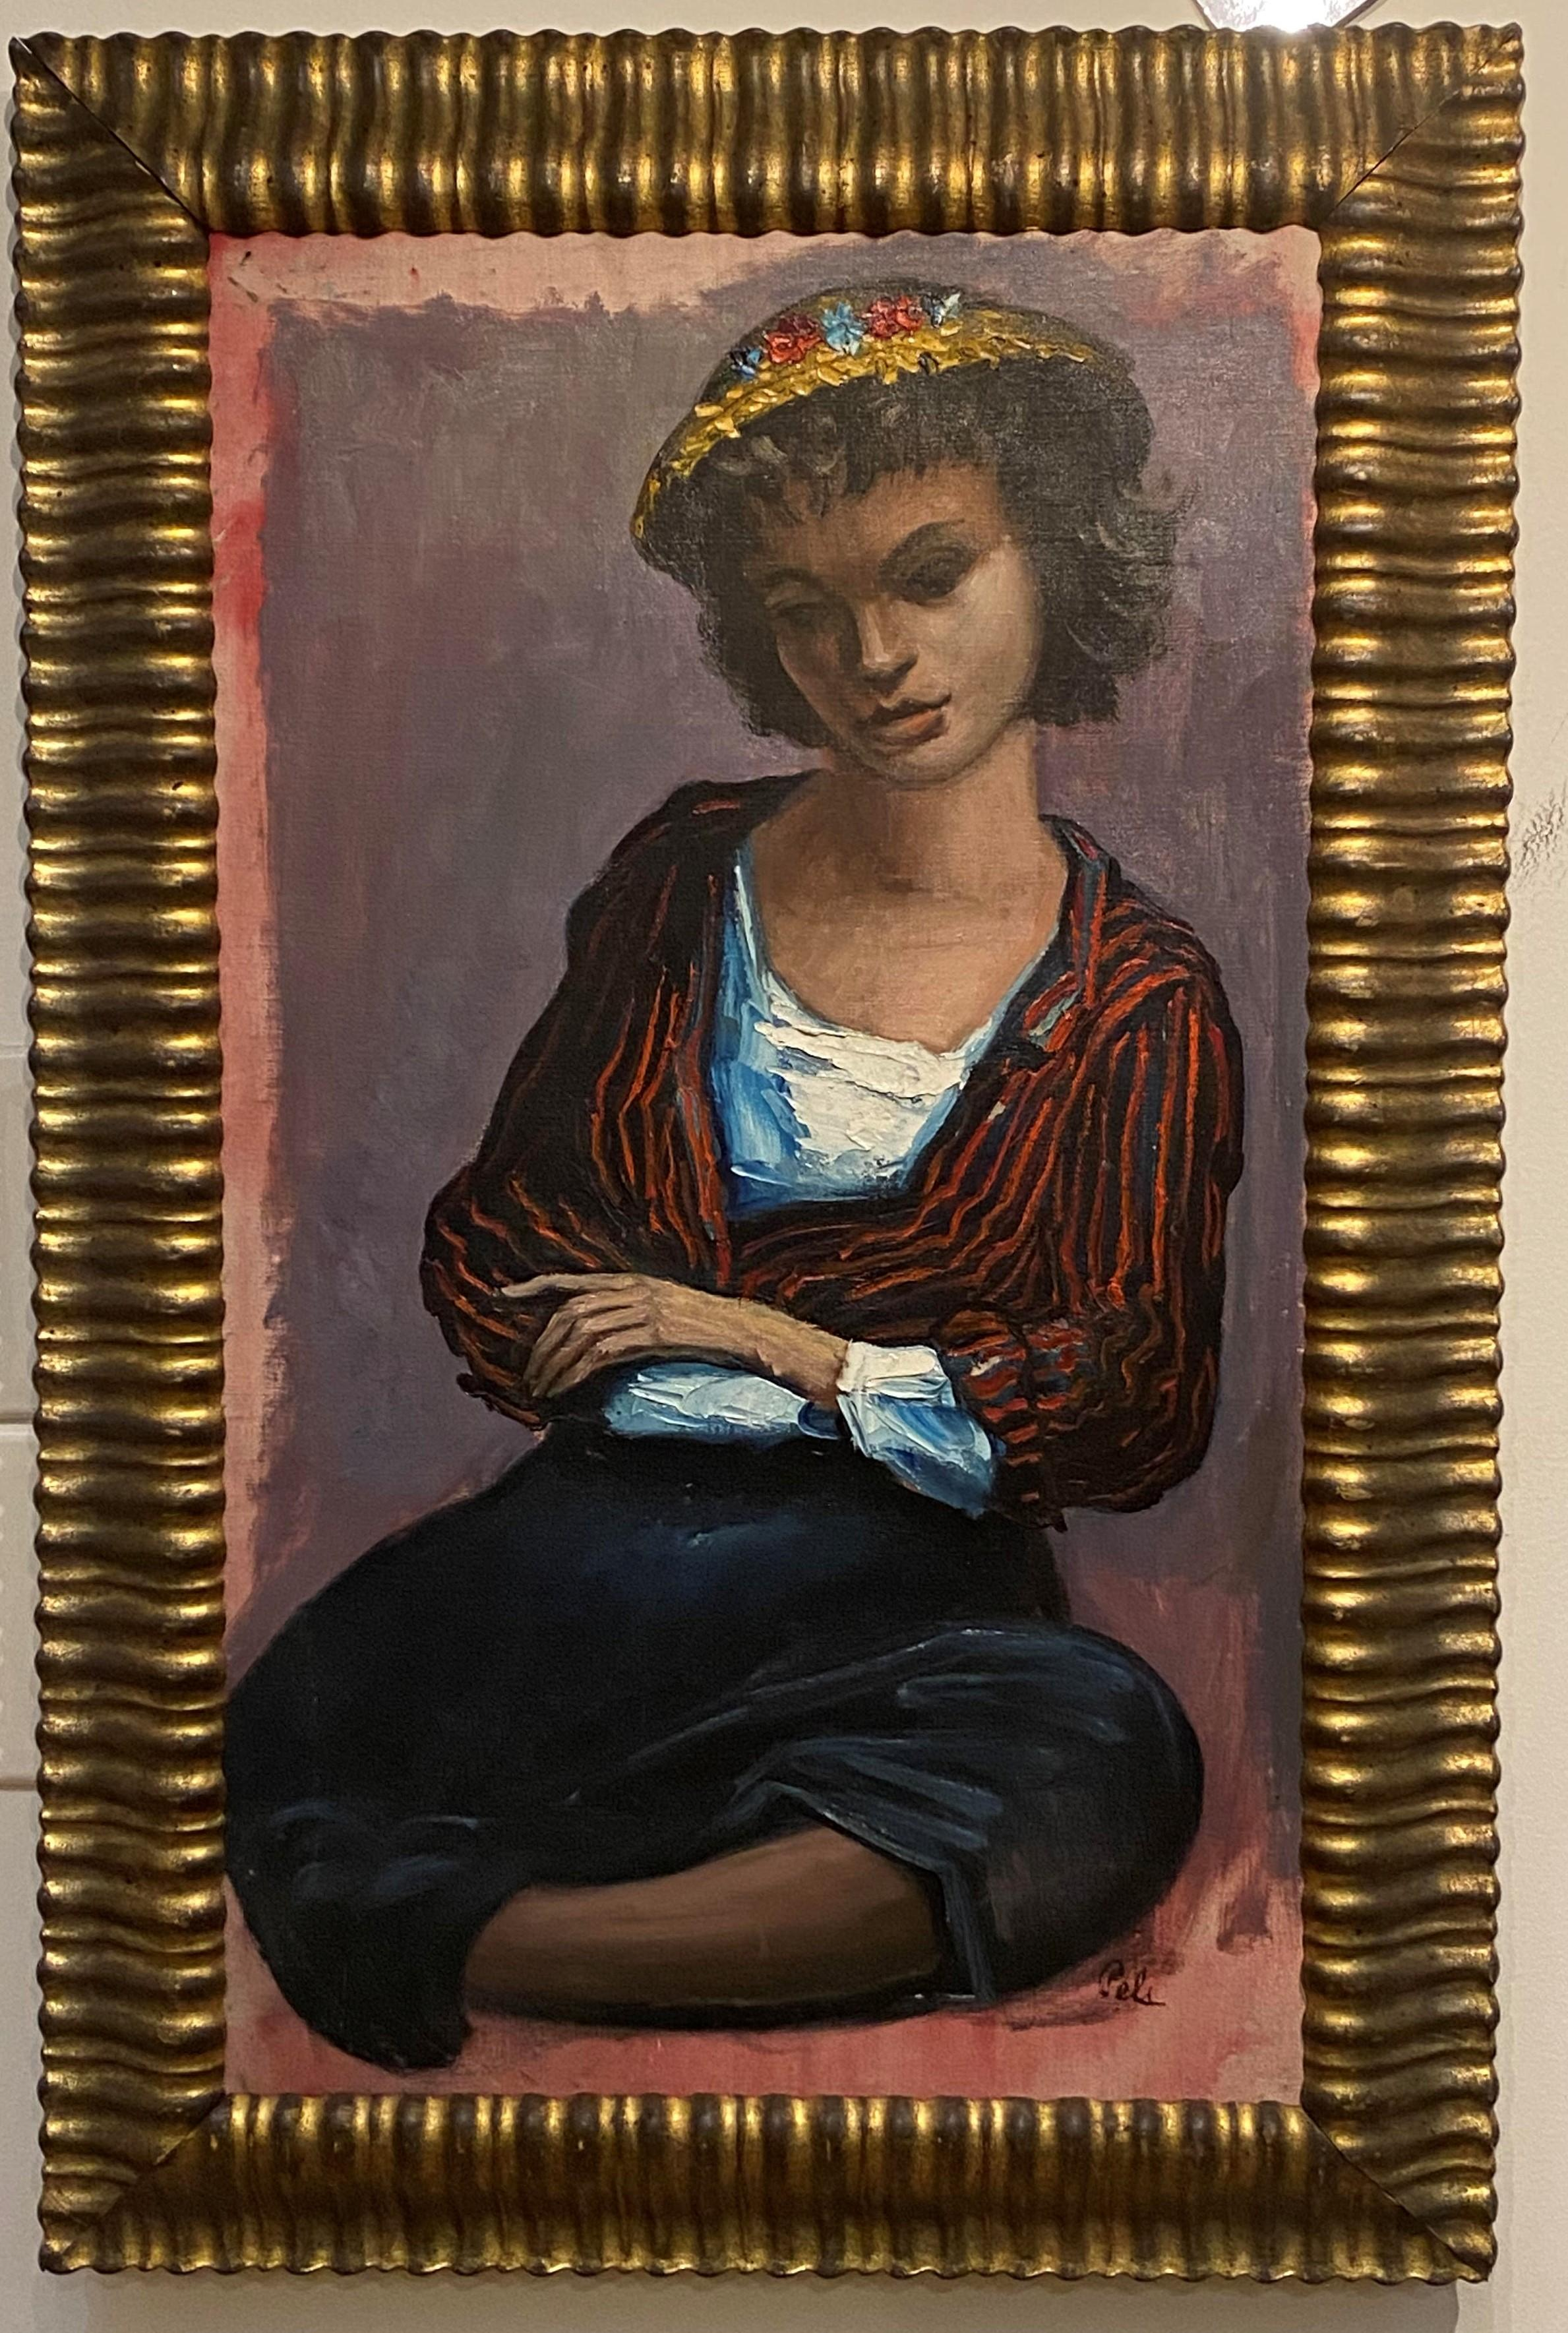 Albert Pels, American 1910-1998 Social realist figural Portrait Oil on Canvas